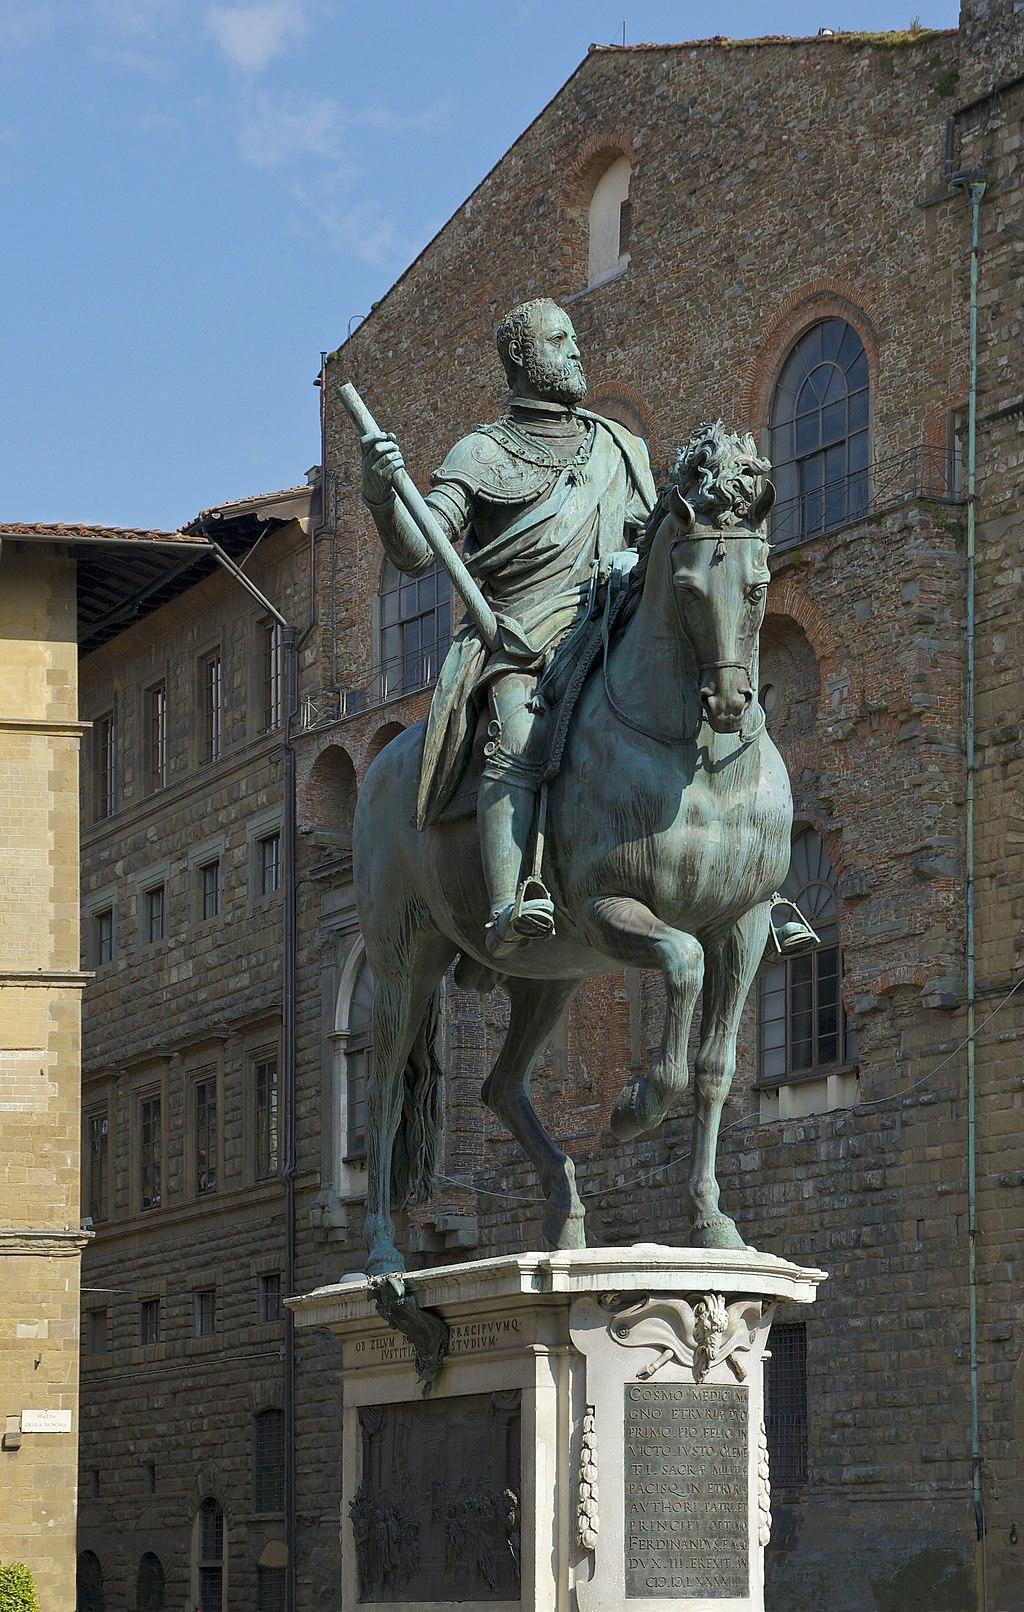 Ruiterstandbeeld van Cosimo I de' Medici op de Piazza della Signoria in Flirenze